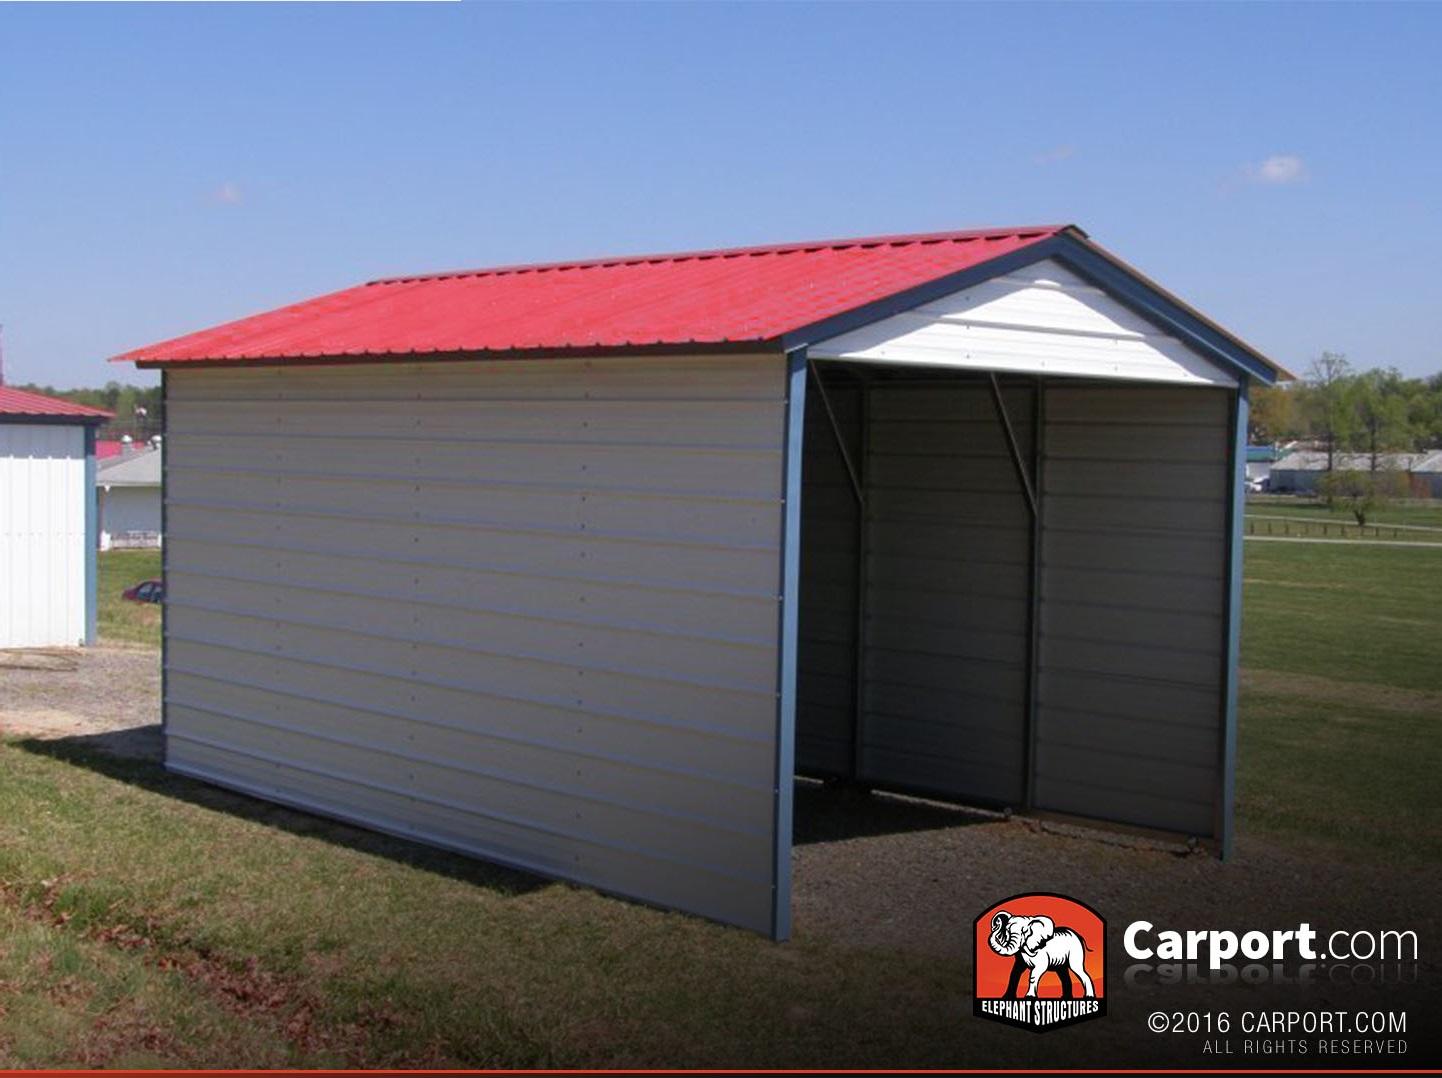 1 Car Metal Carport 12 x 21 with Vertical Roof  Metal Carport Pricing